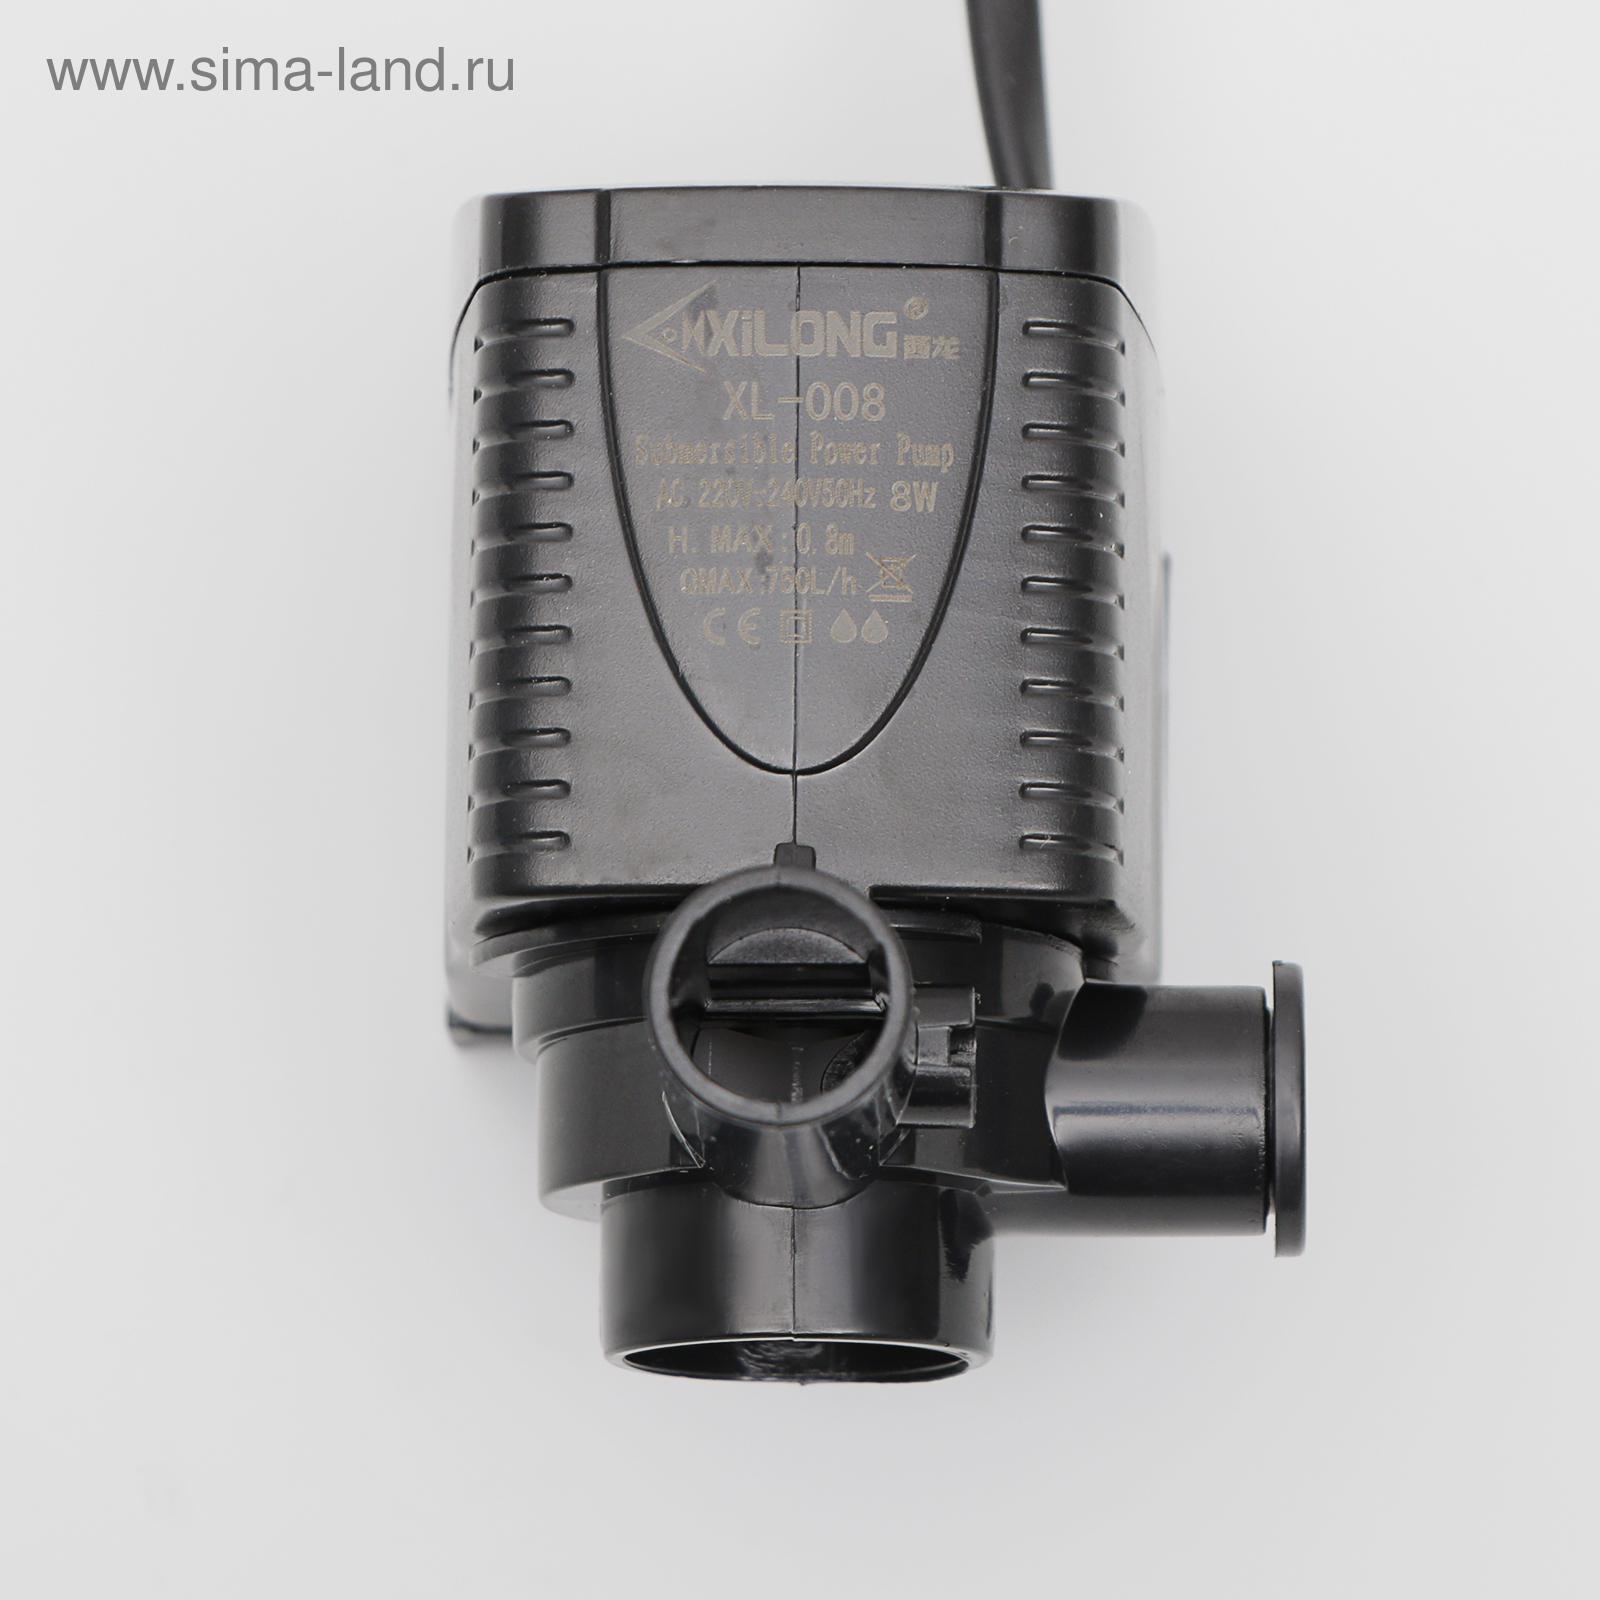 Помпа перемешивающая СИЛОНГ XL-008 12Вт, 600л ч, h.max 0,8м (2307548 ... bddebbe112c